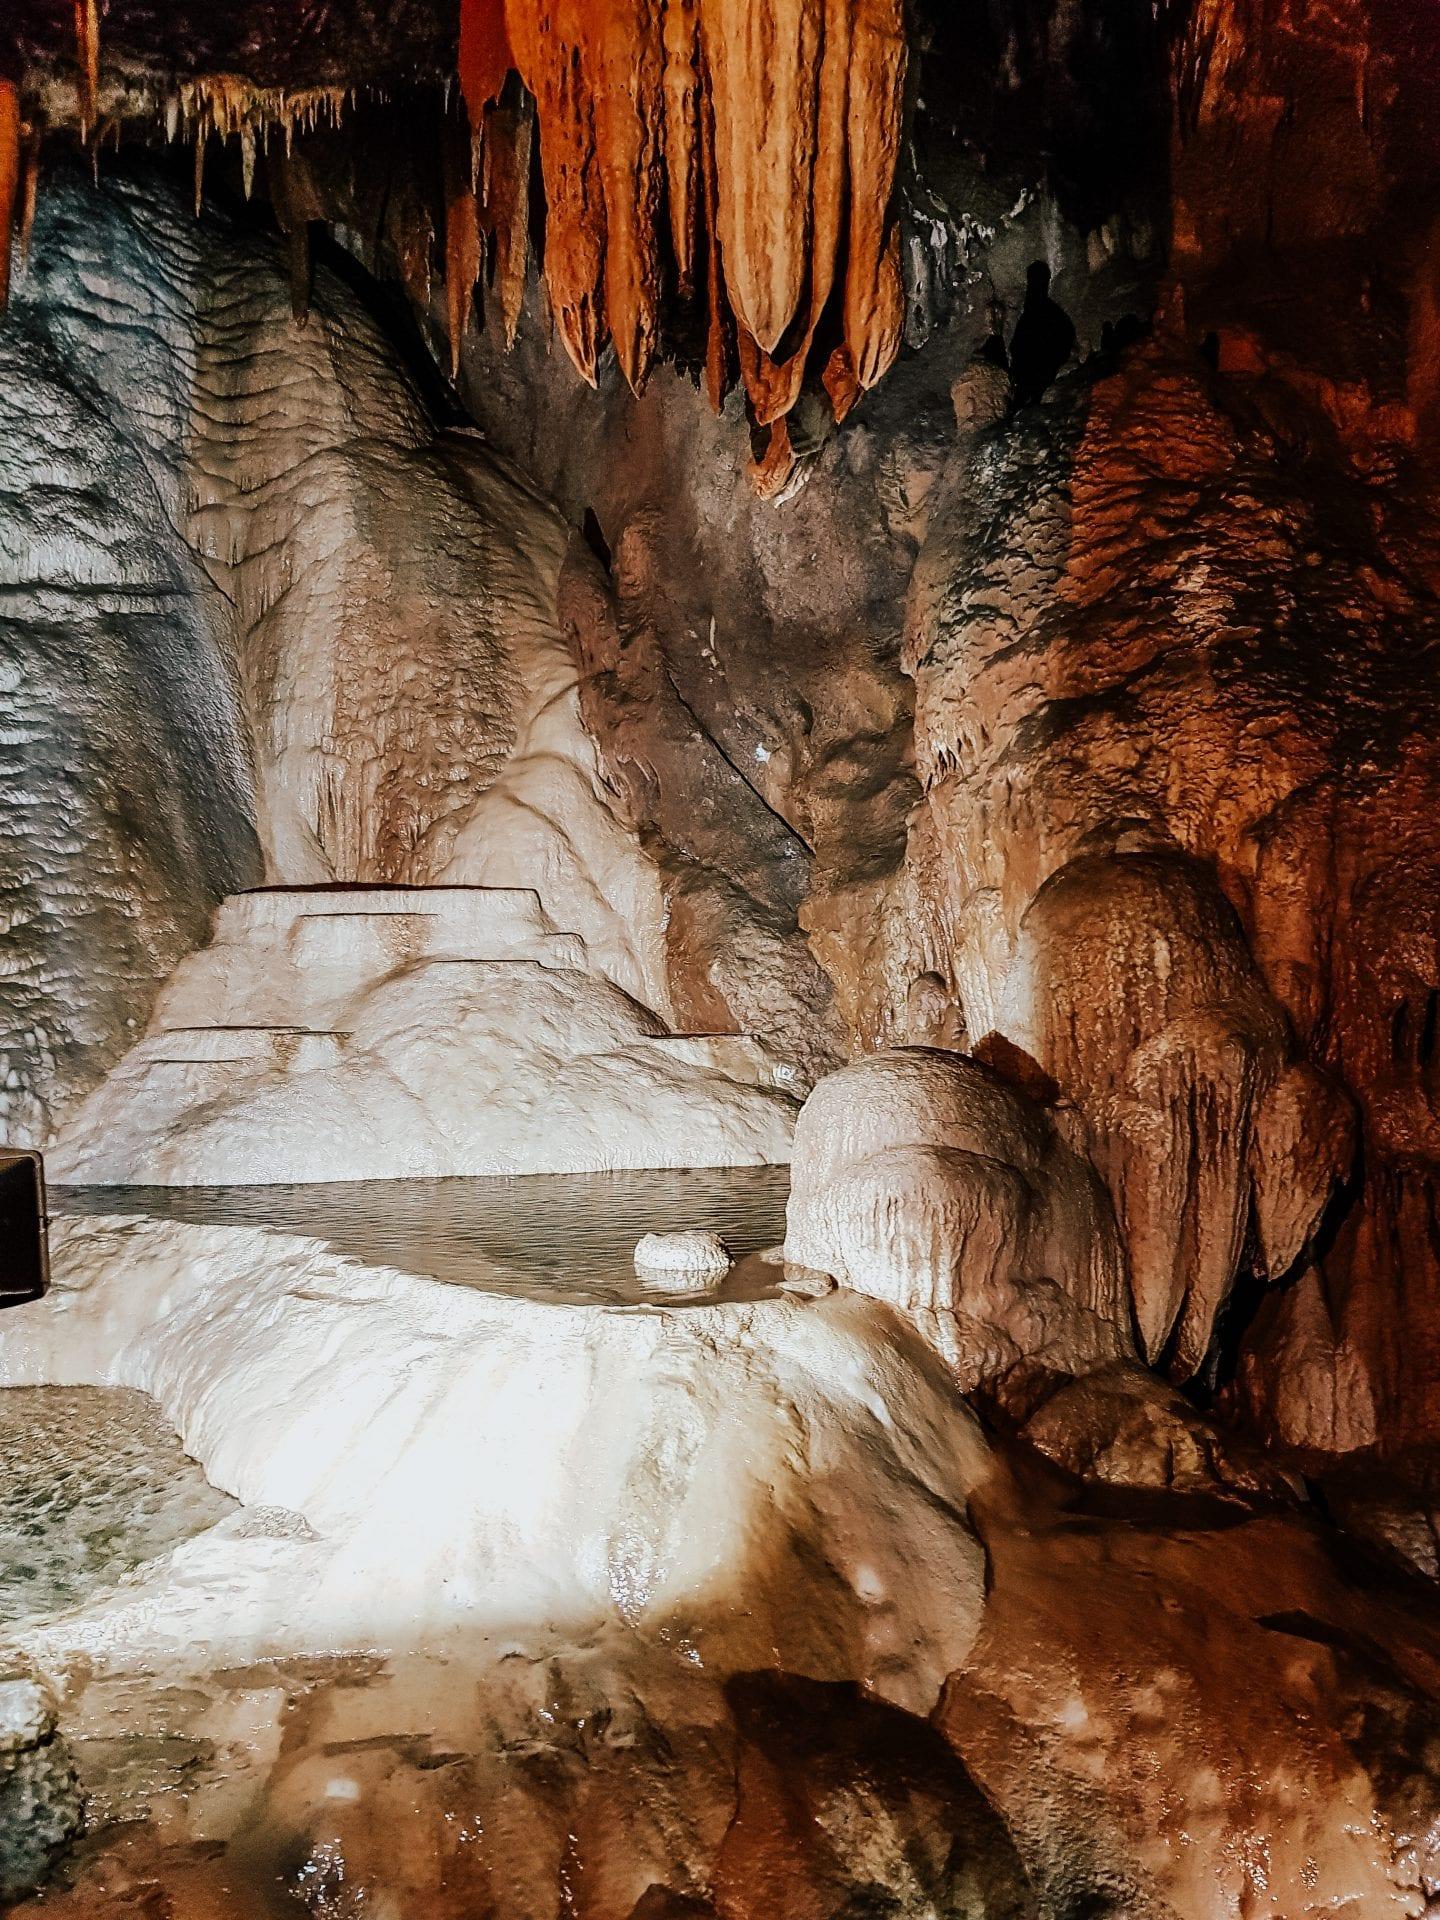 grotta di du mannau in italy, sardinia